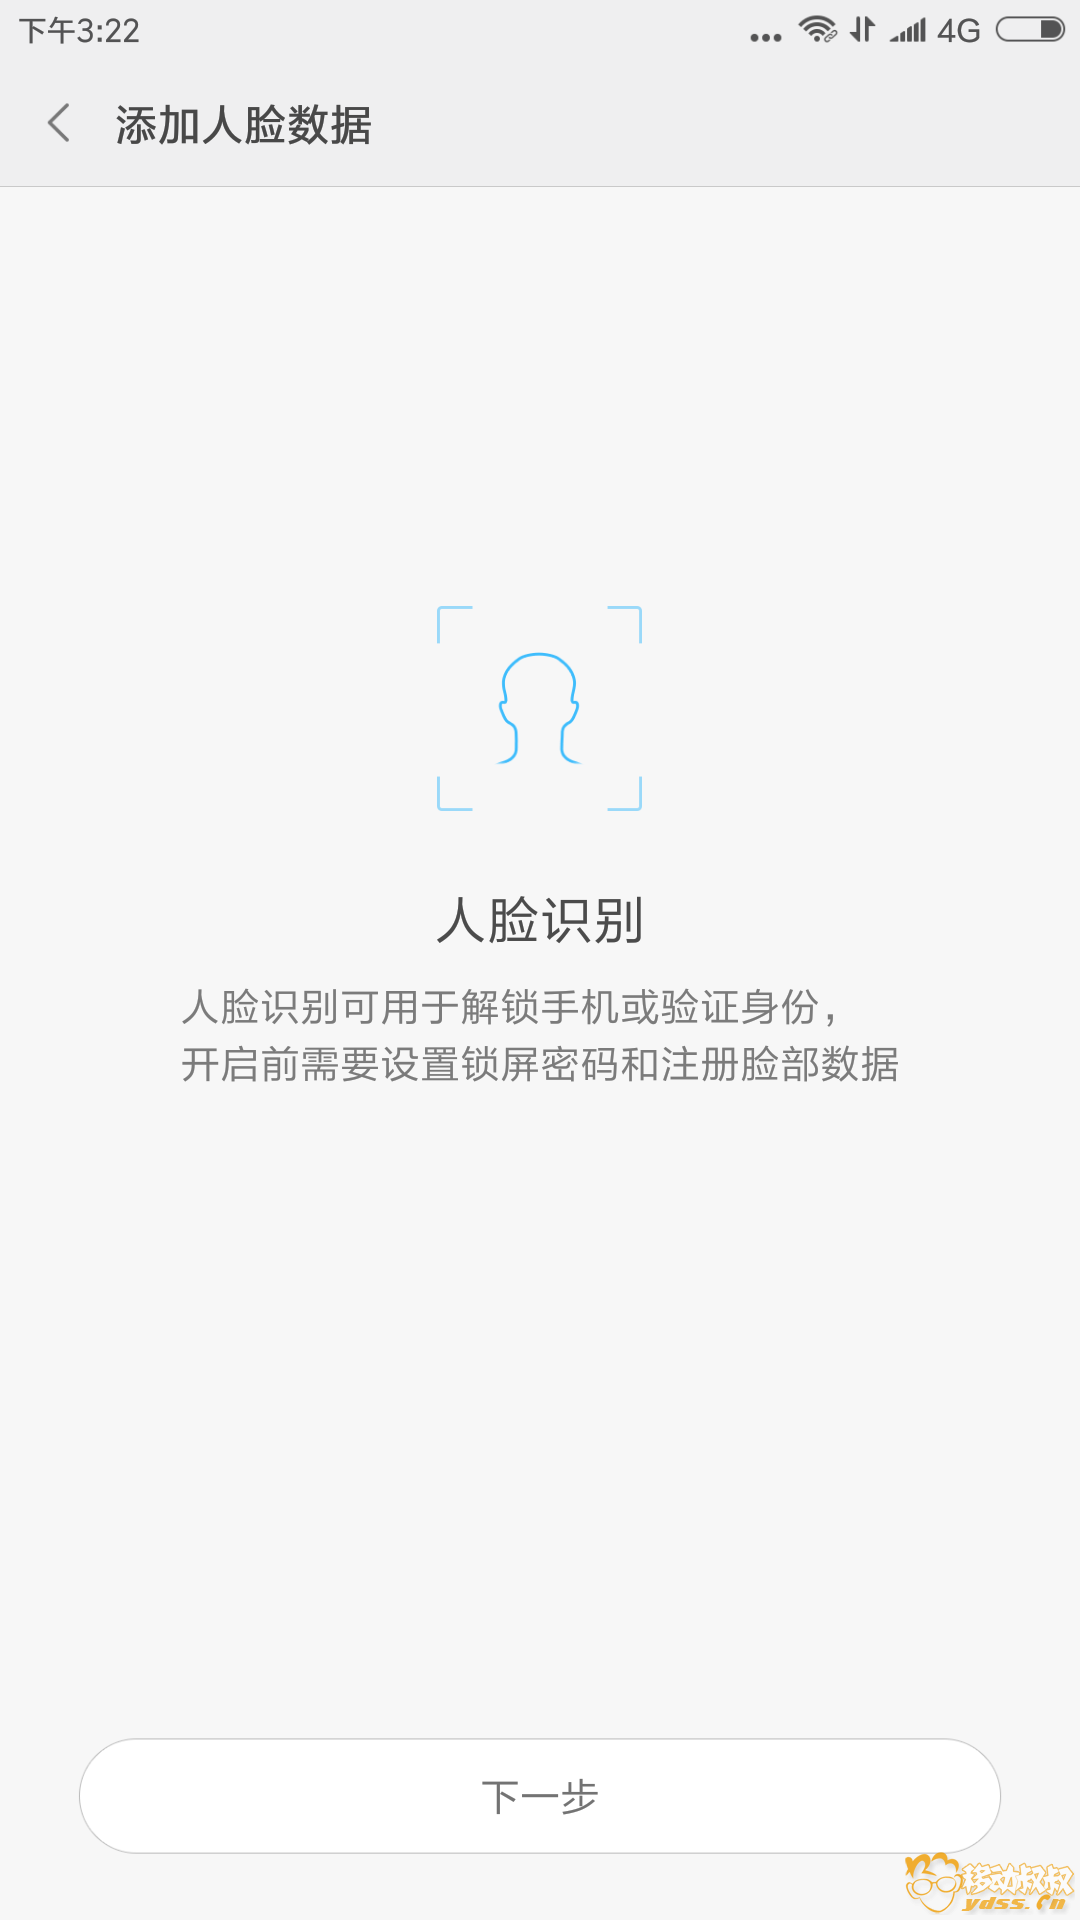 Screenshot_2017-12-11-15-22-39-790_com.android.keyguard.png